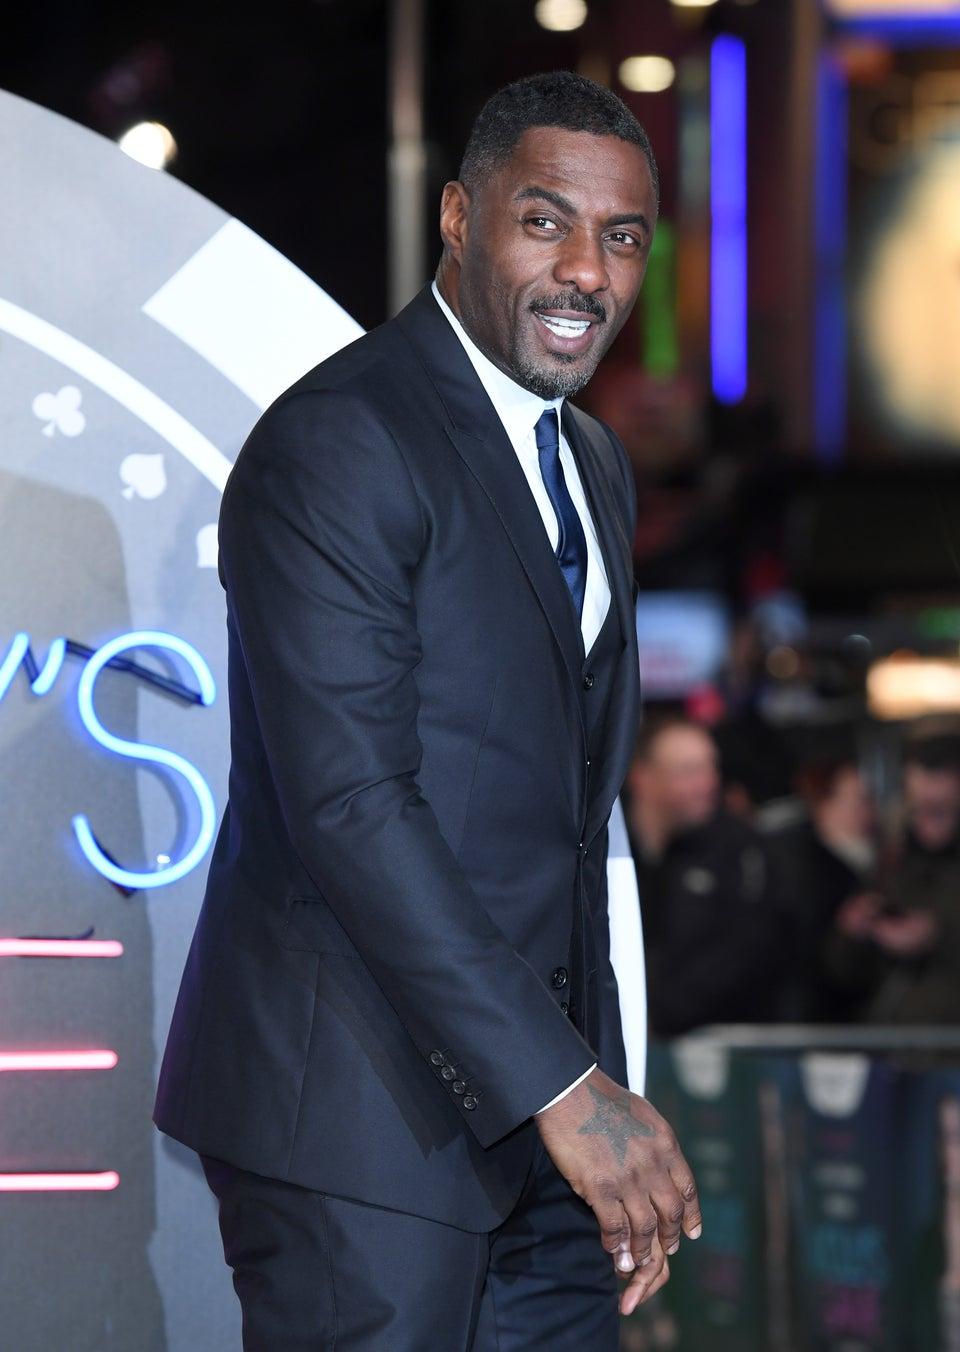 6 Fun Ways To Bring Idris Elba Home For Christmas